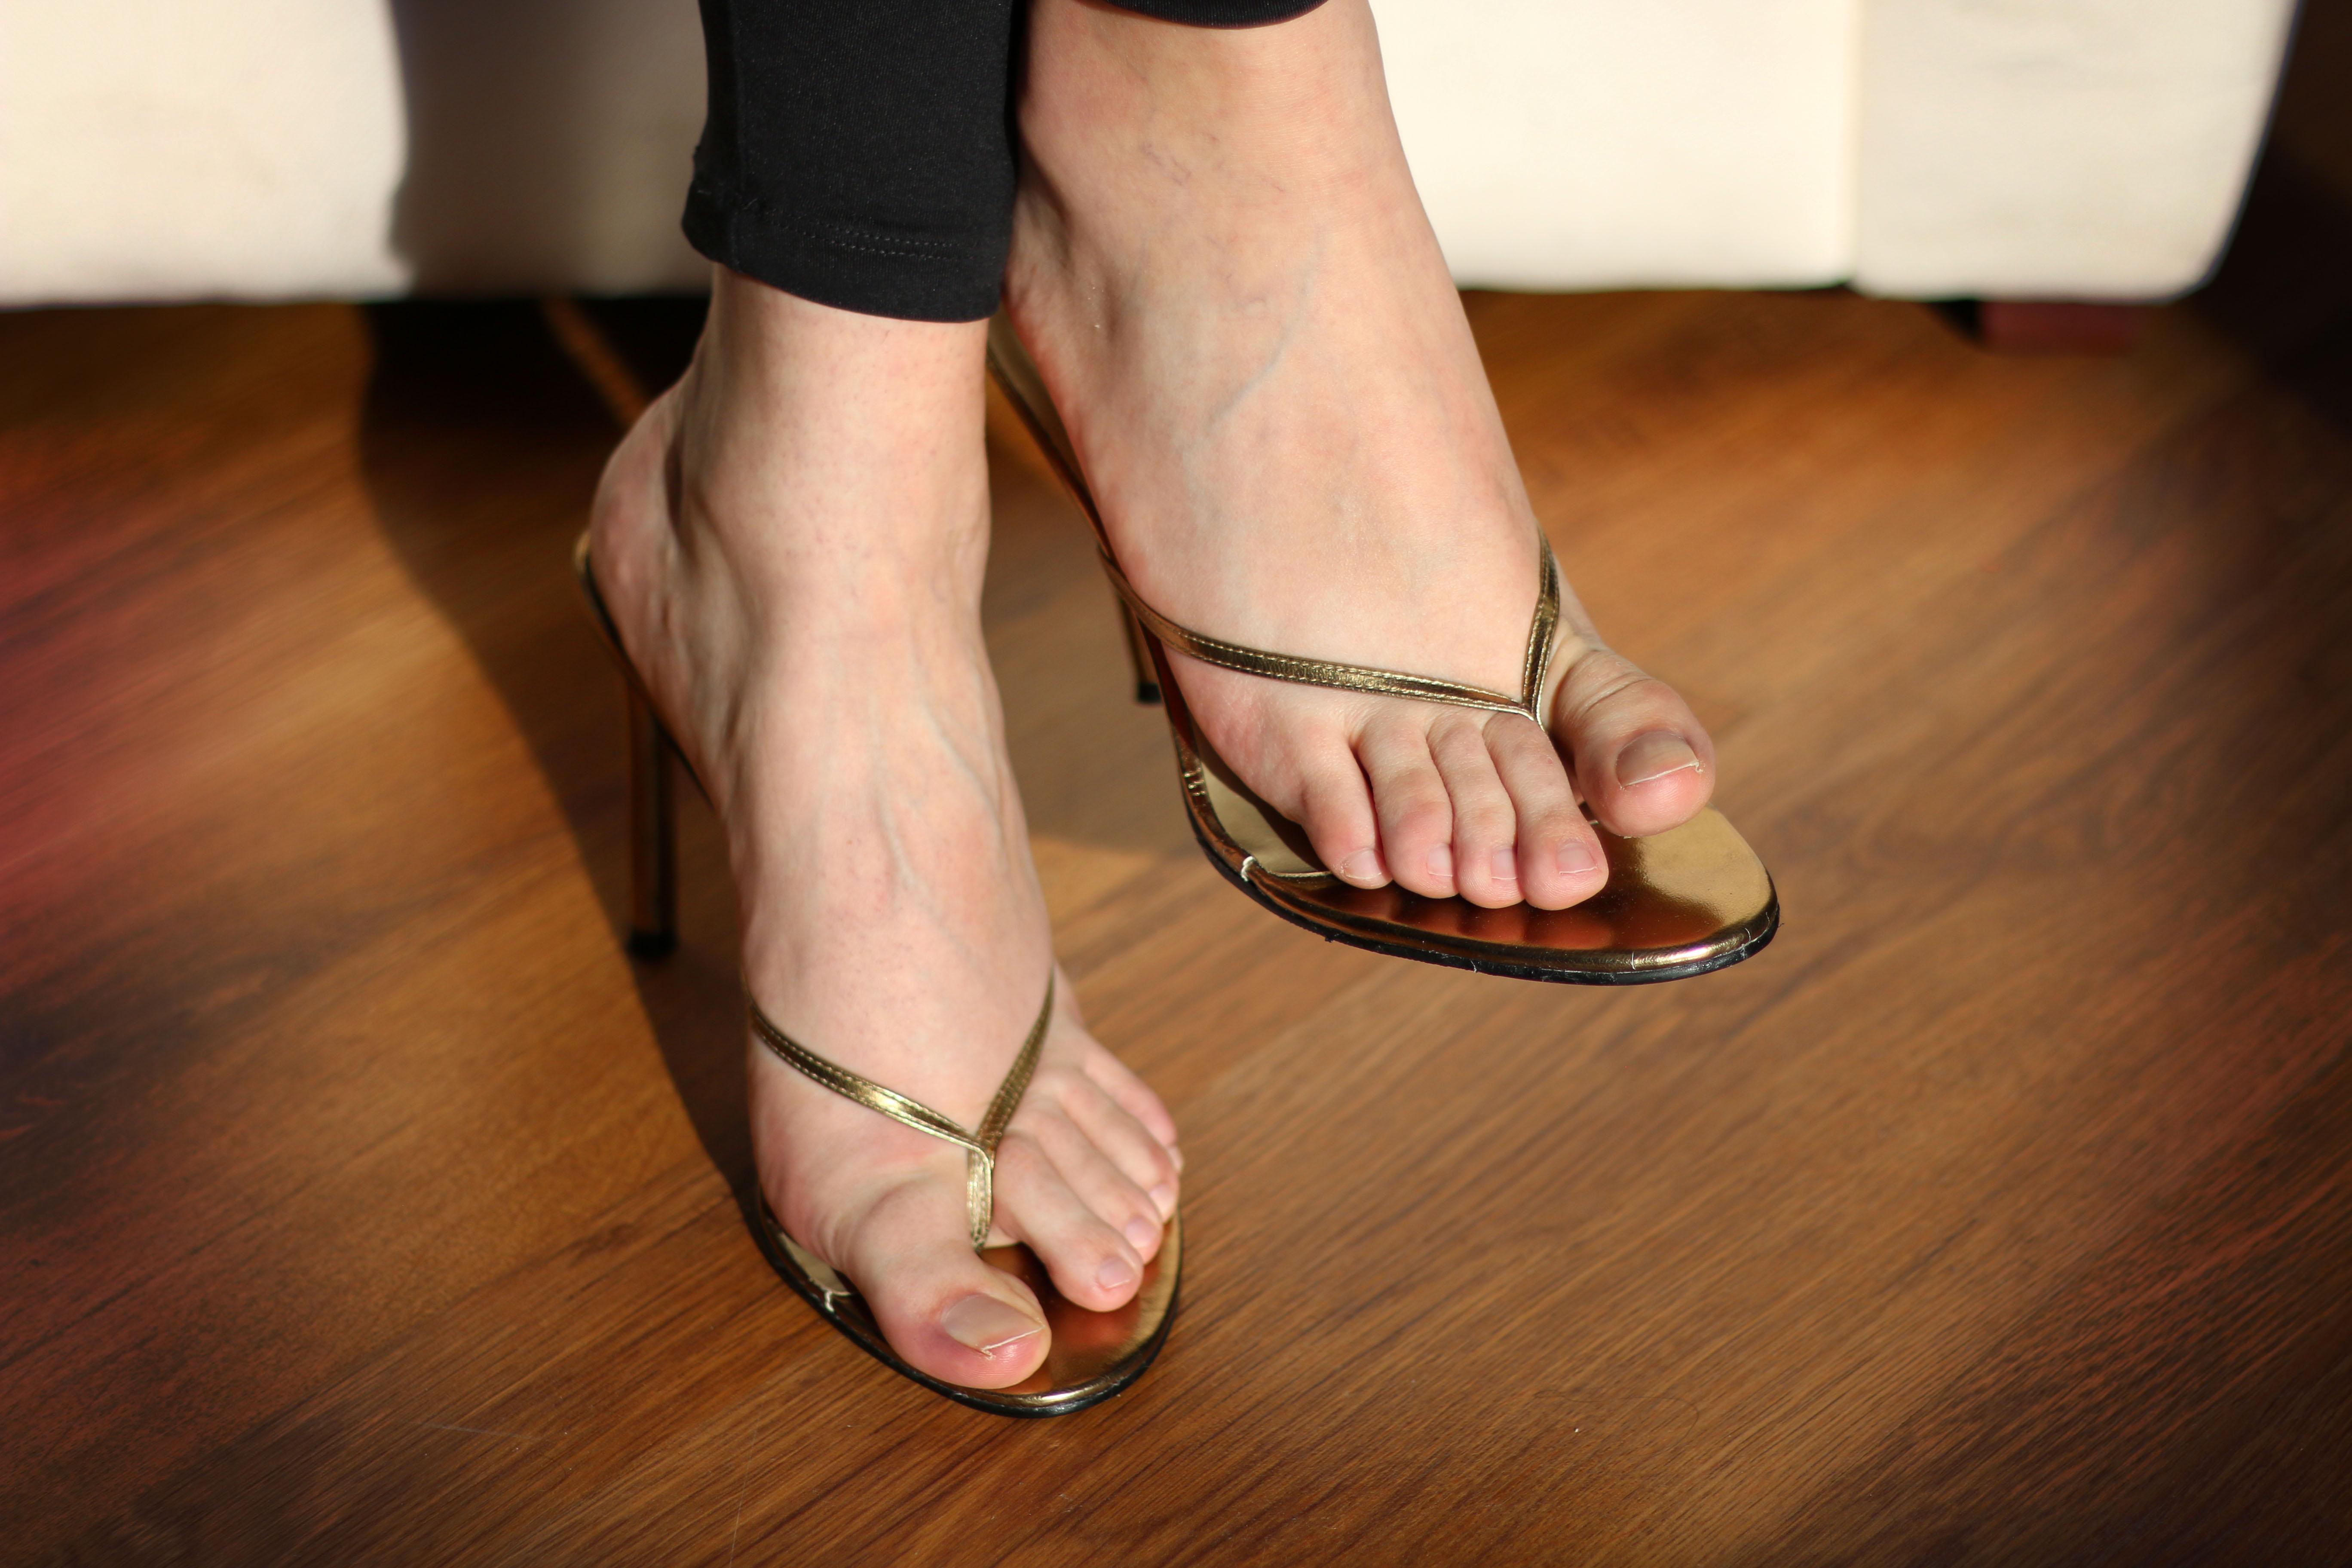 fake-tits-sexy-women-feet